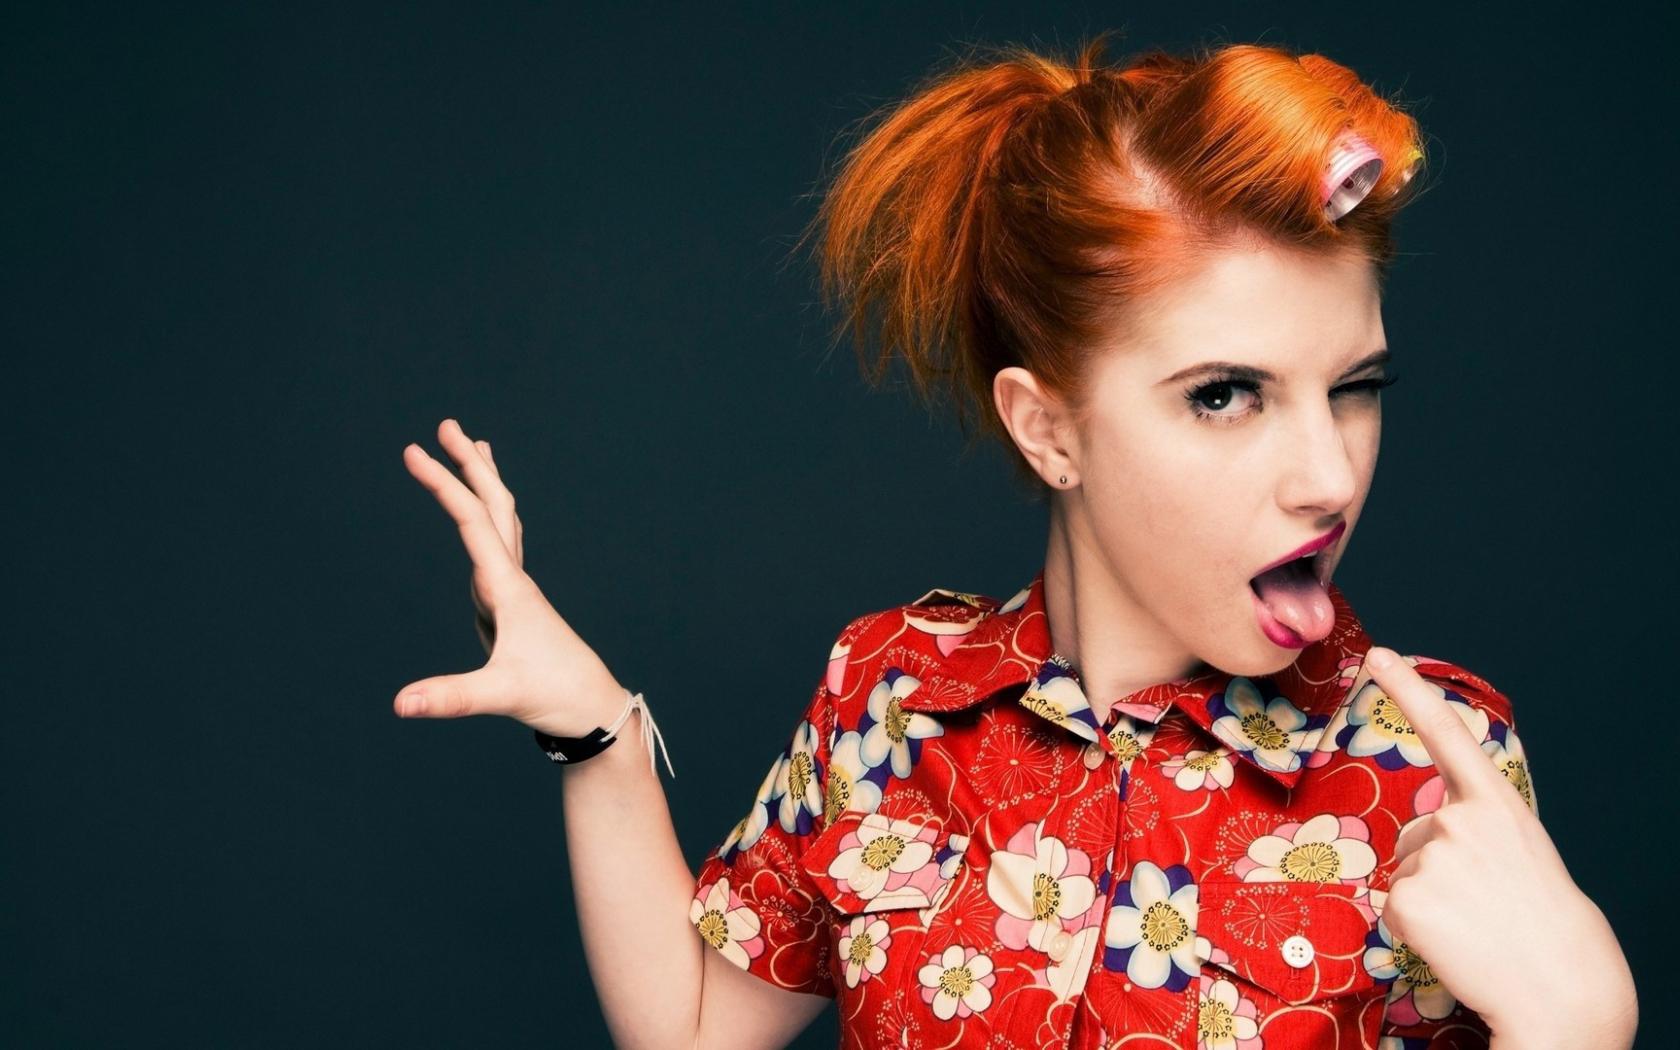 Hayley williams fashion site 8